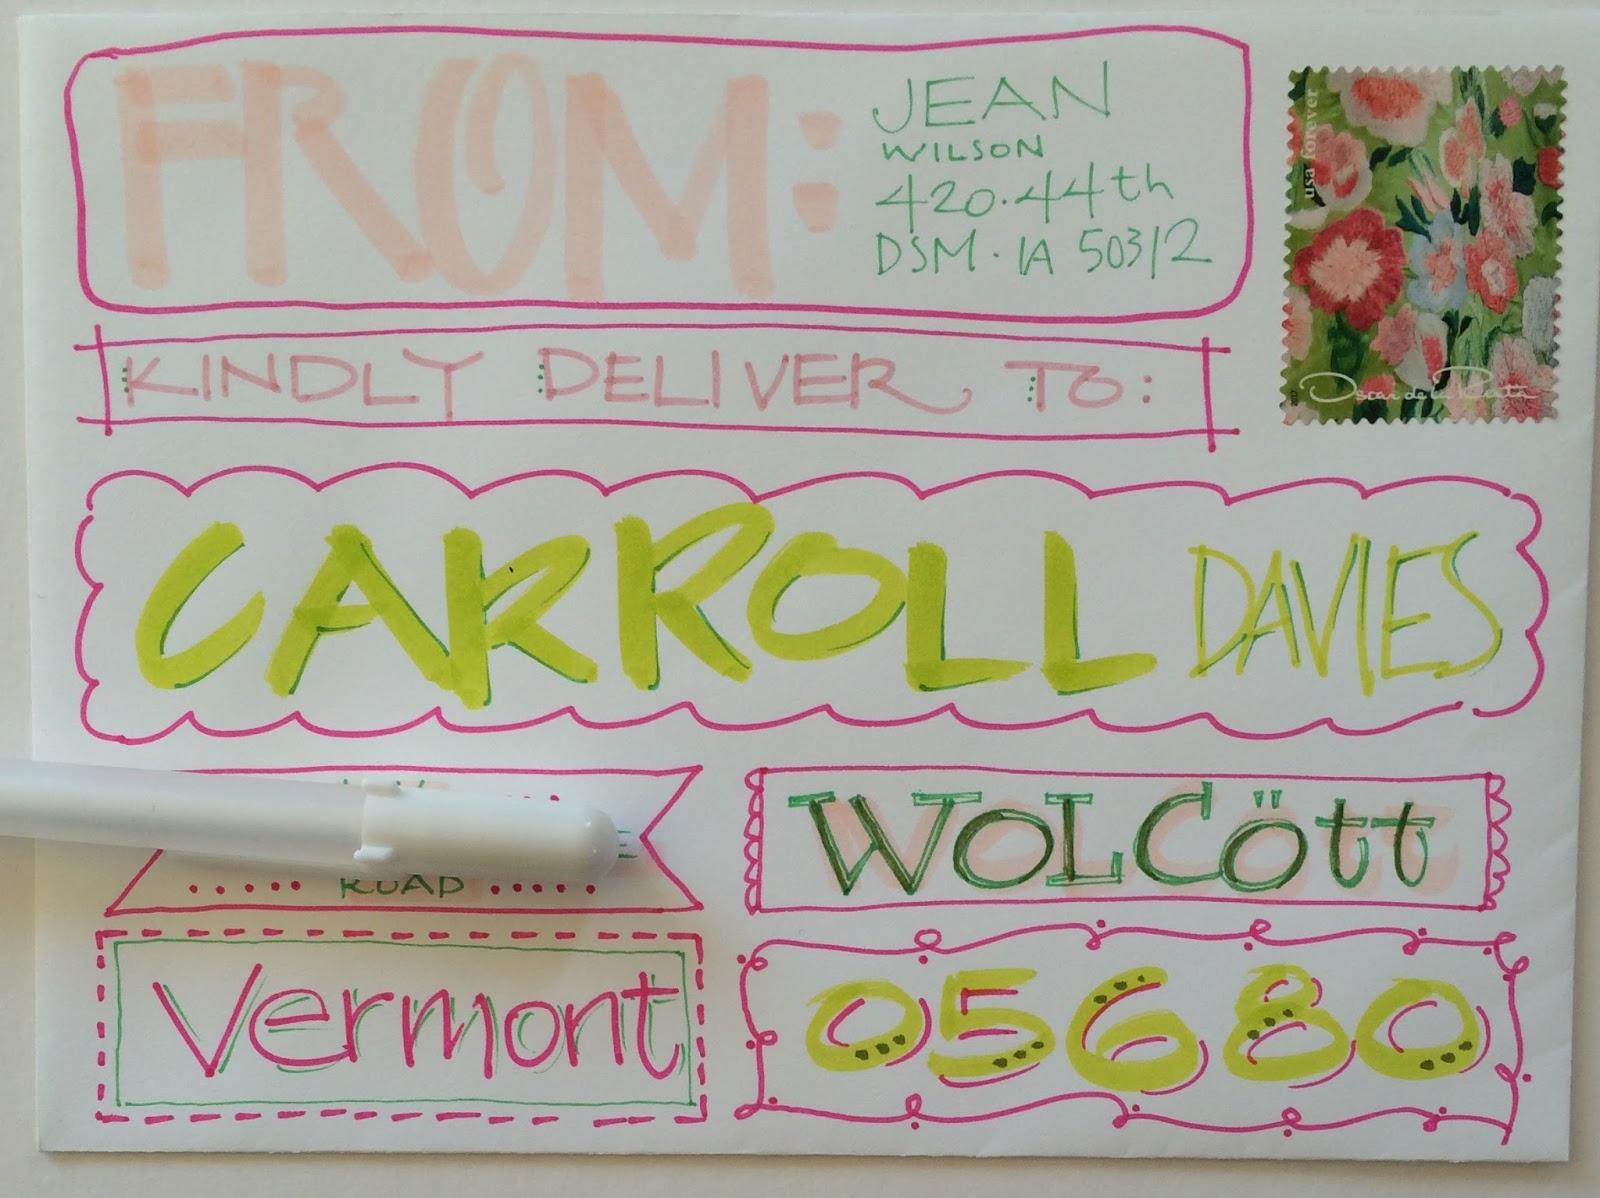 9206899120603665088 as well Fpmb 1 To Carroll likewise Sellos Oscar De La Renta Para Tus Cartas furthermore Oscar Renta Get Nyc Street Named After Him as well Clinton The Late Oscar De La Renta An Exemplary Immigrant. on oscar de la renta stamps